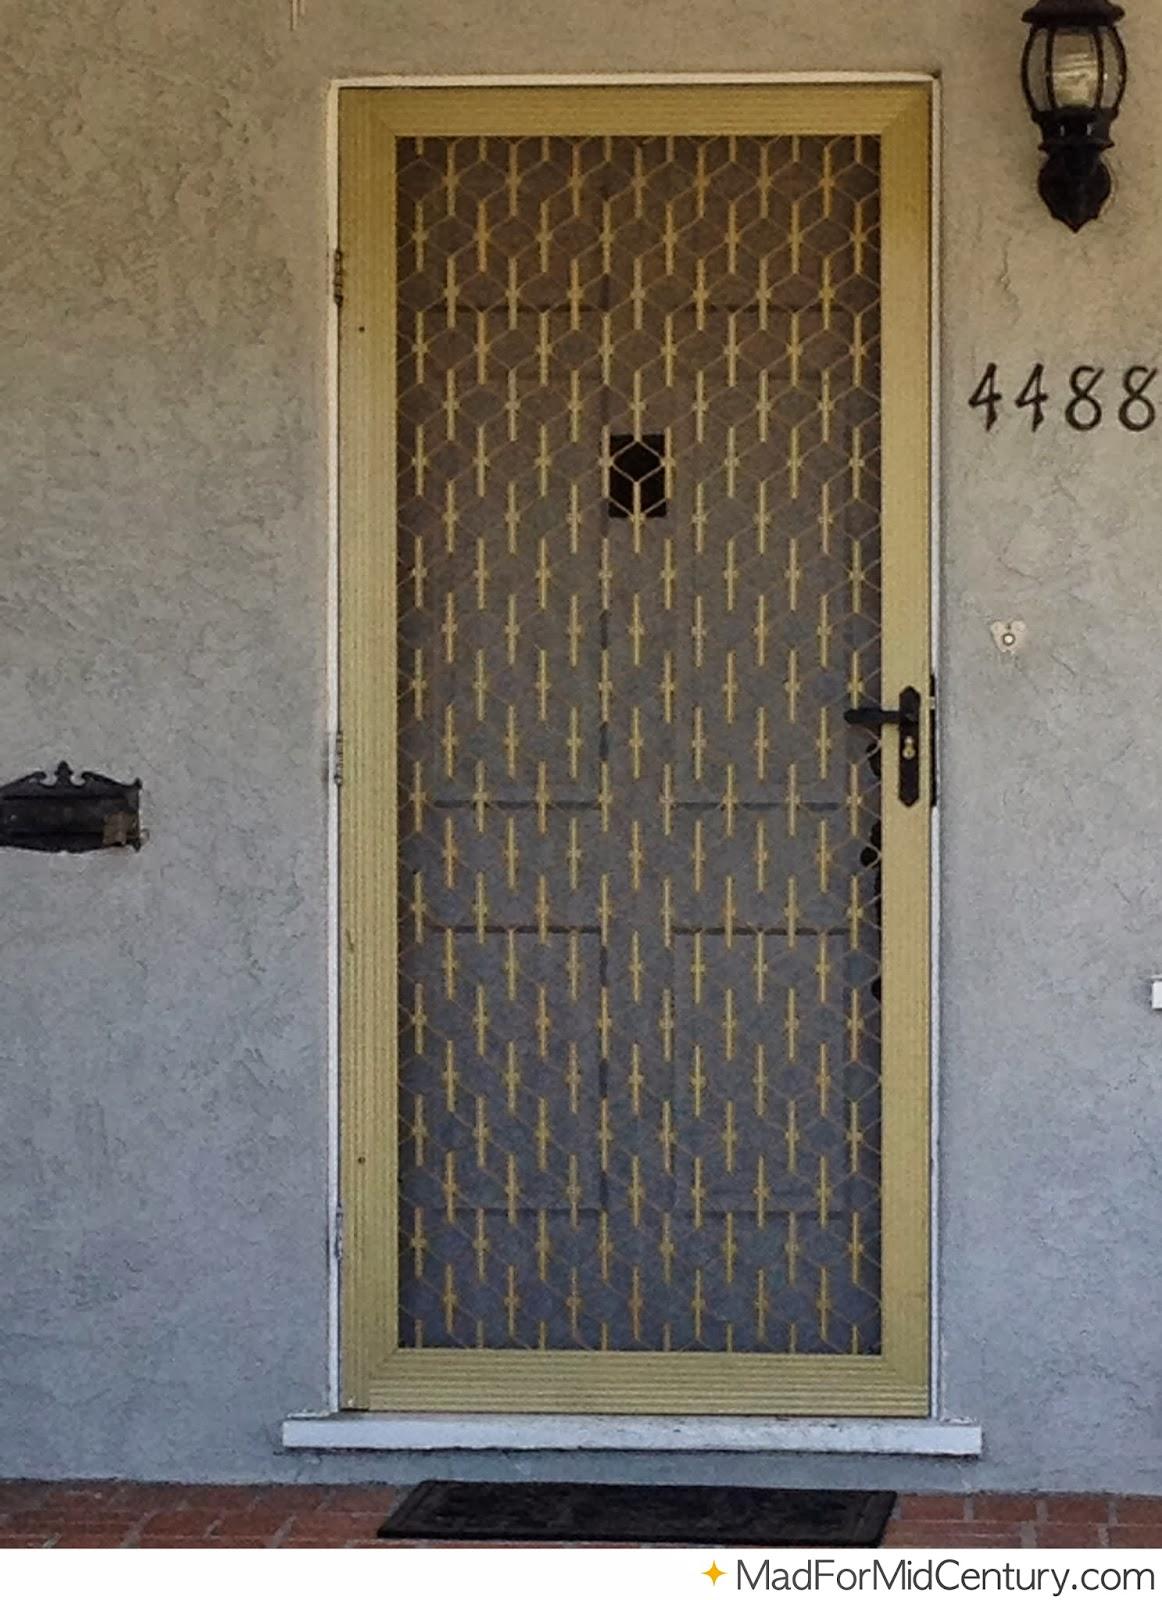 Mad for Mid-Century: Authentic Mid-Century Doors